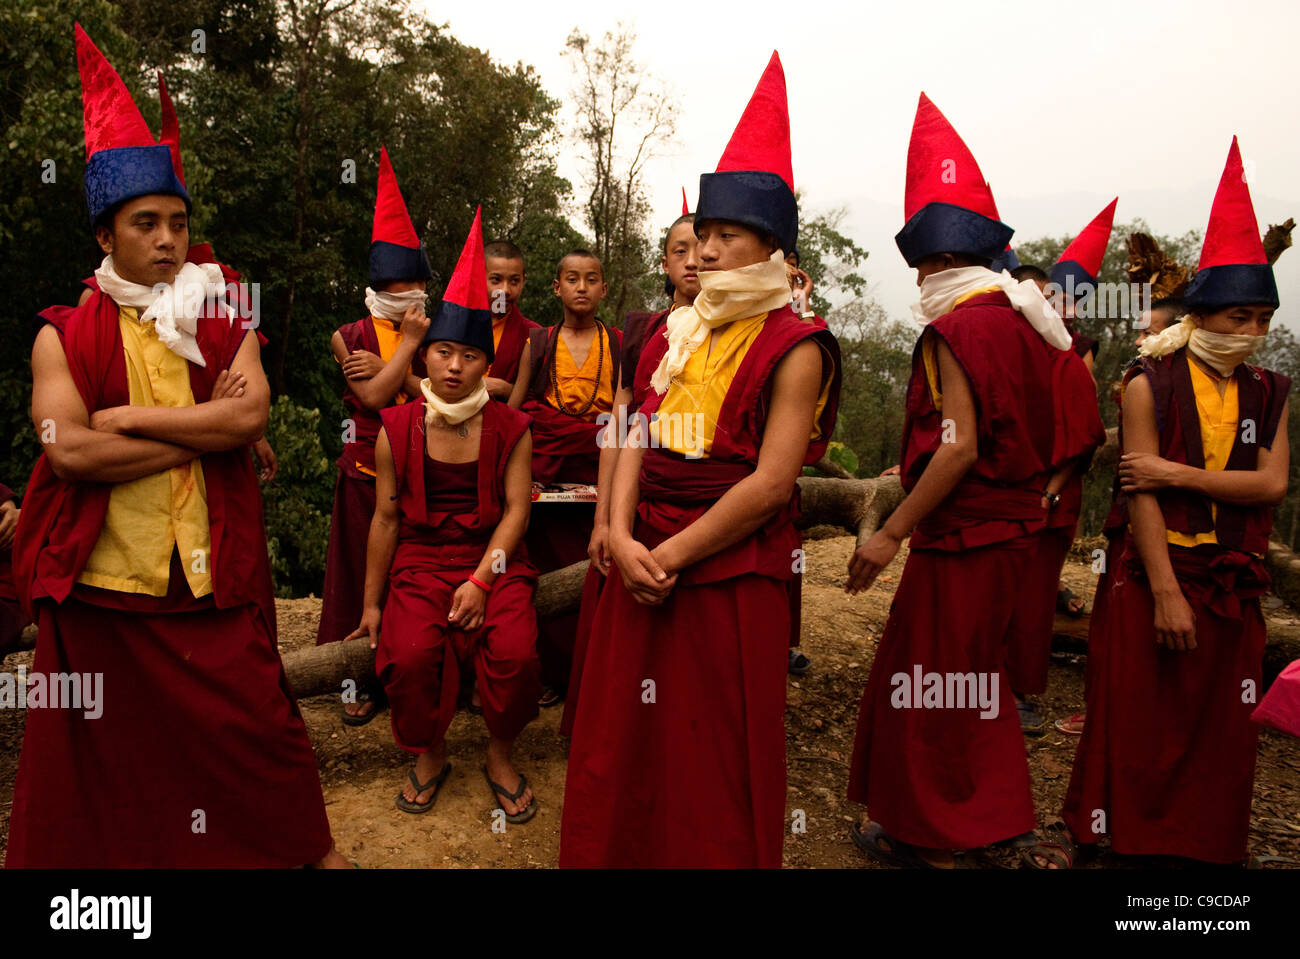 Buddhist Monk Hats Stock Photos   Buddhist Monk Hats Stock Images ... 5838b7f1fd9